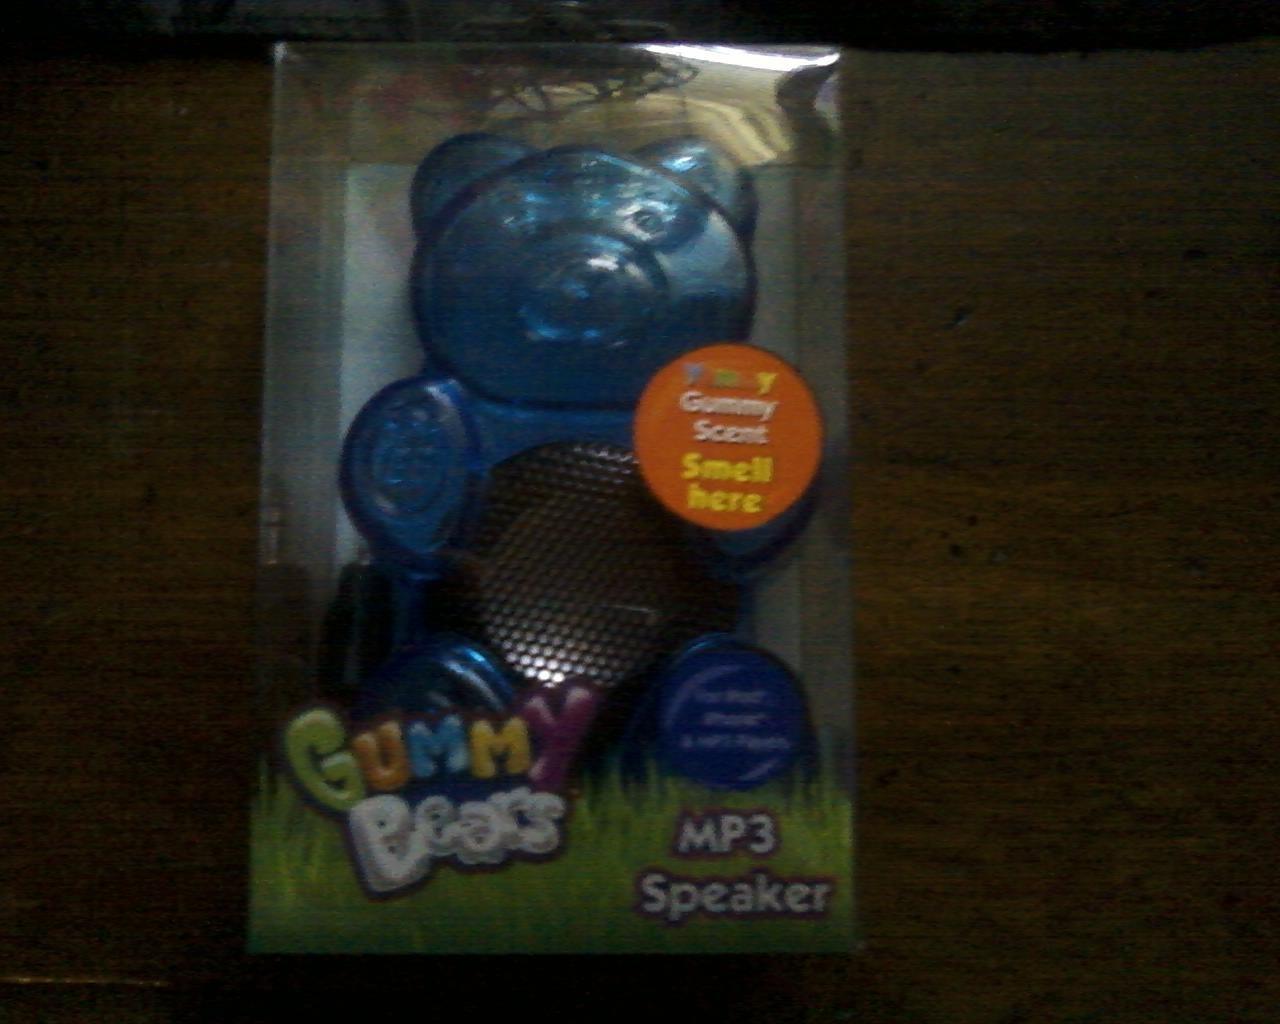 Grape Gummy Bear 10024-GRAPE Scented Speakers